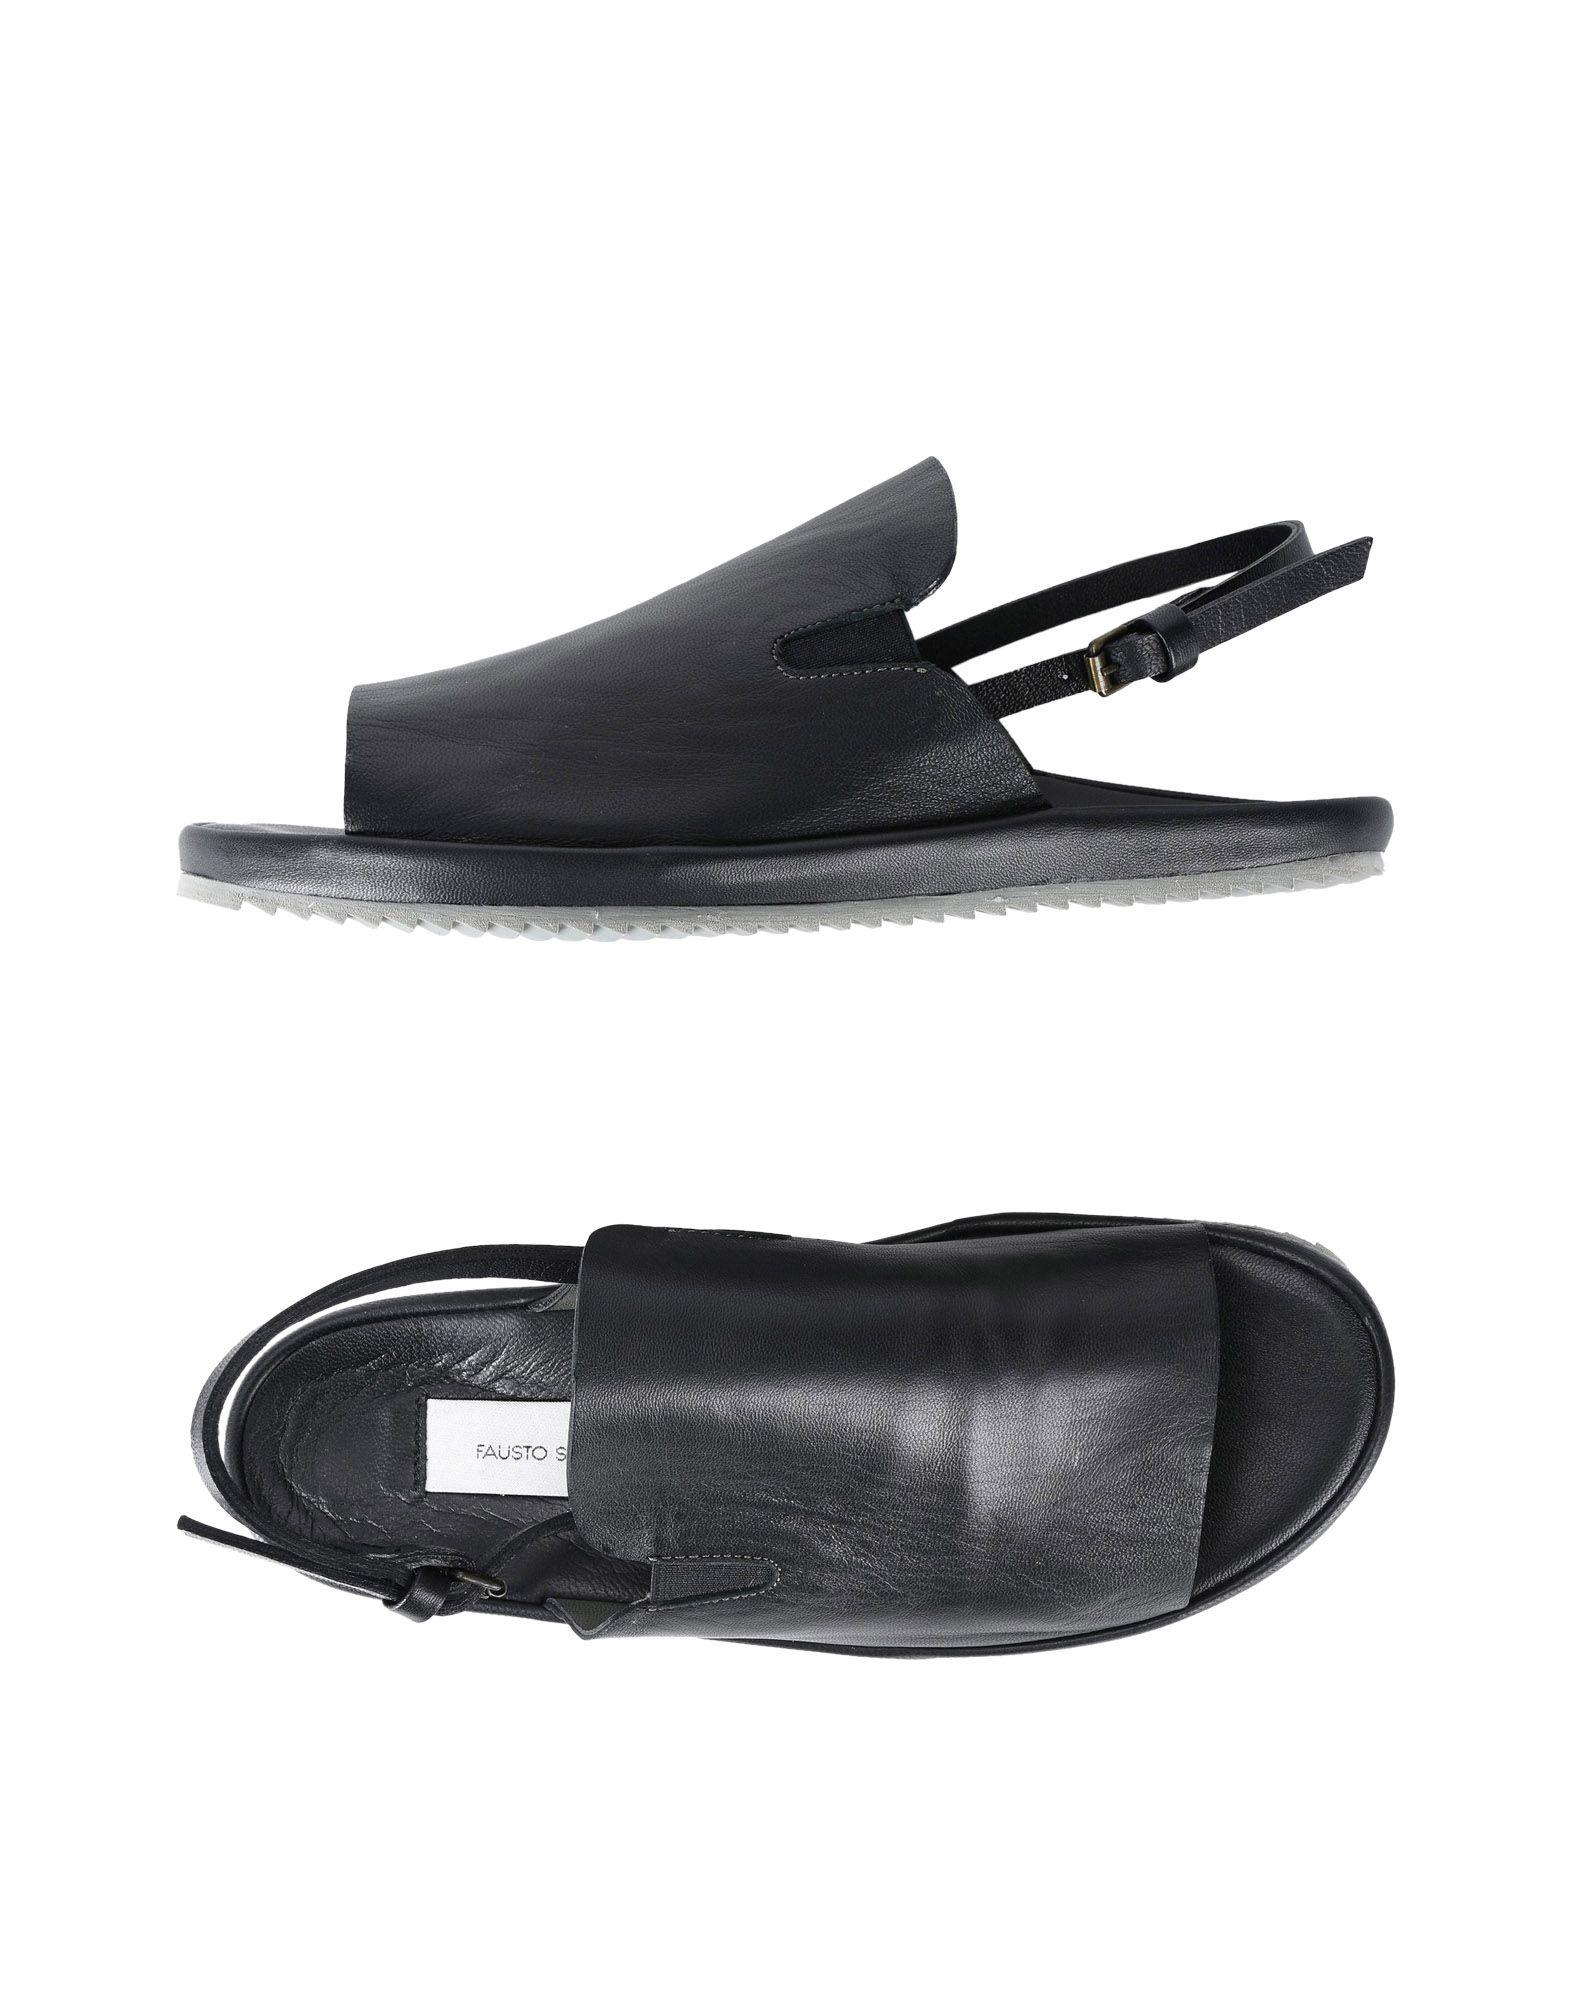 Stilvolle billige Schuhe Fausto 11503426QX Santini Sandalen Damen  11503426QX Fausto 295f8b